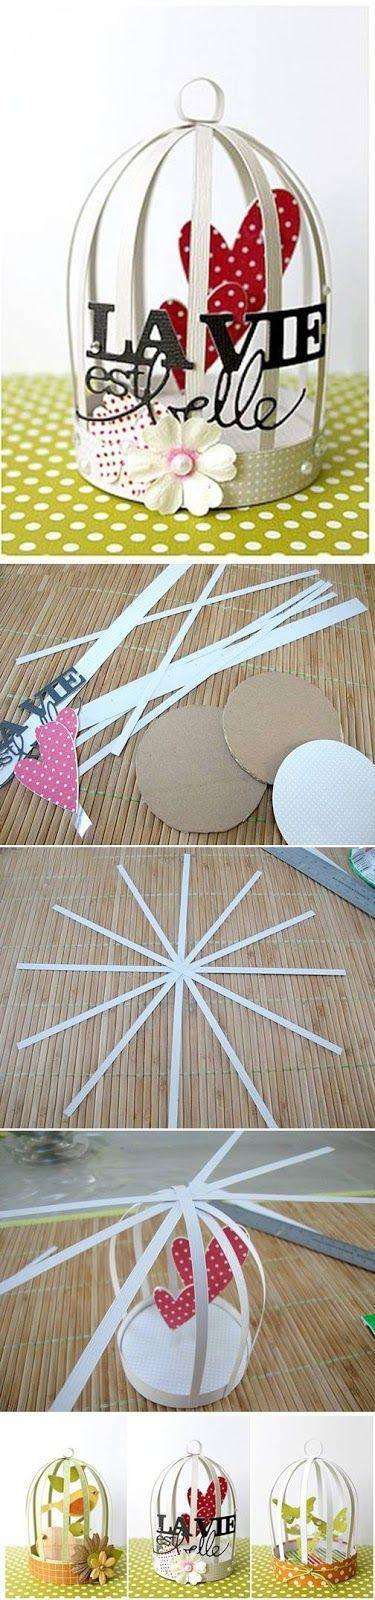 How To Make Mini Decorative Cage